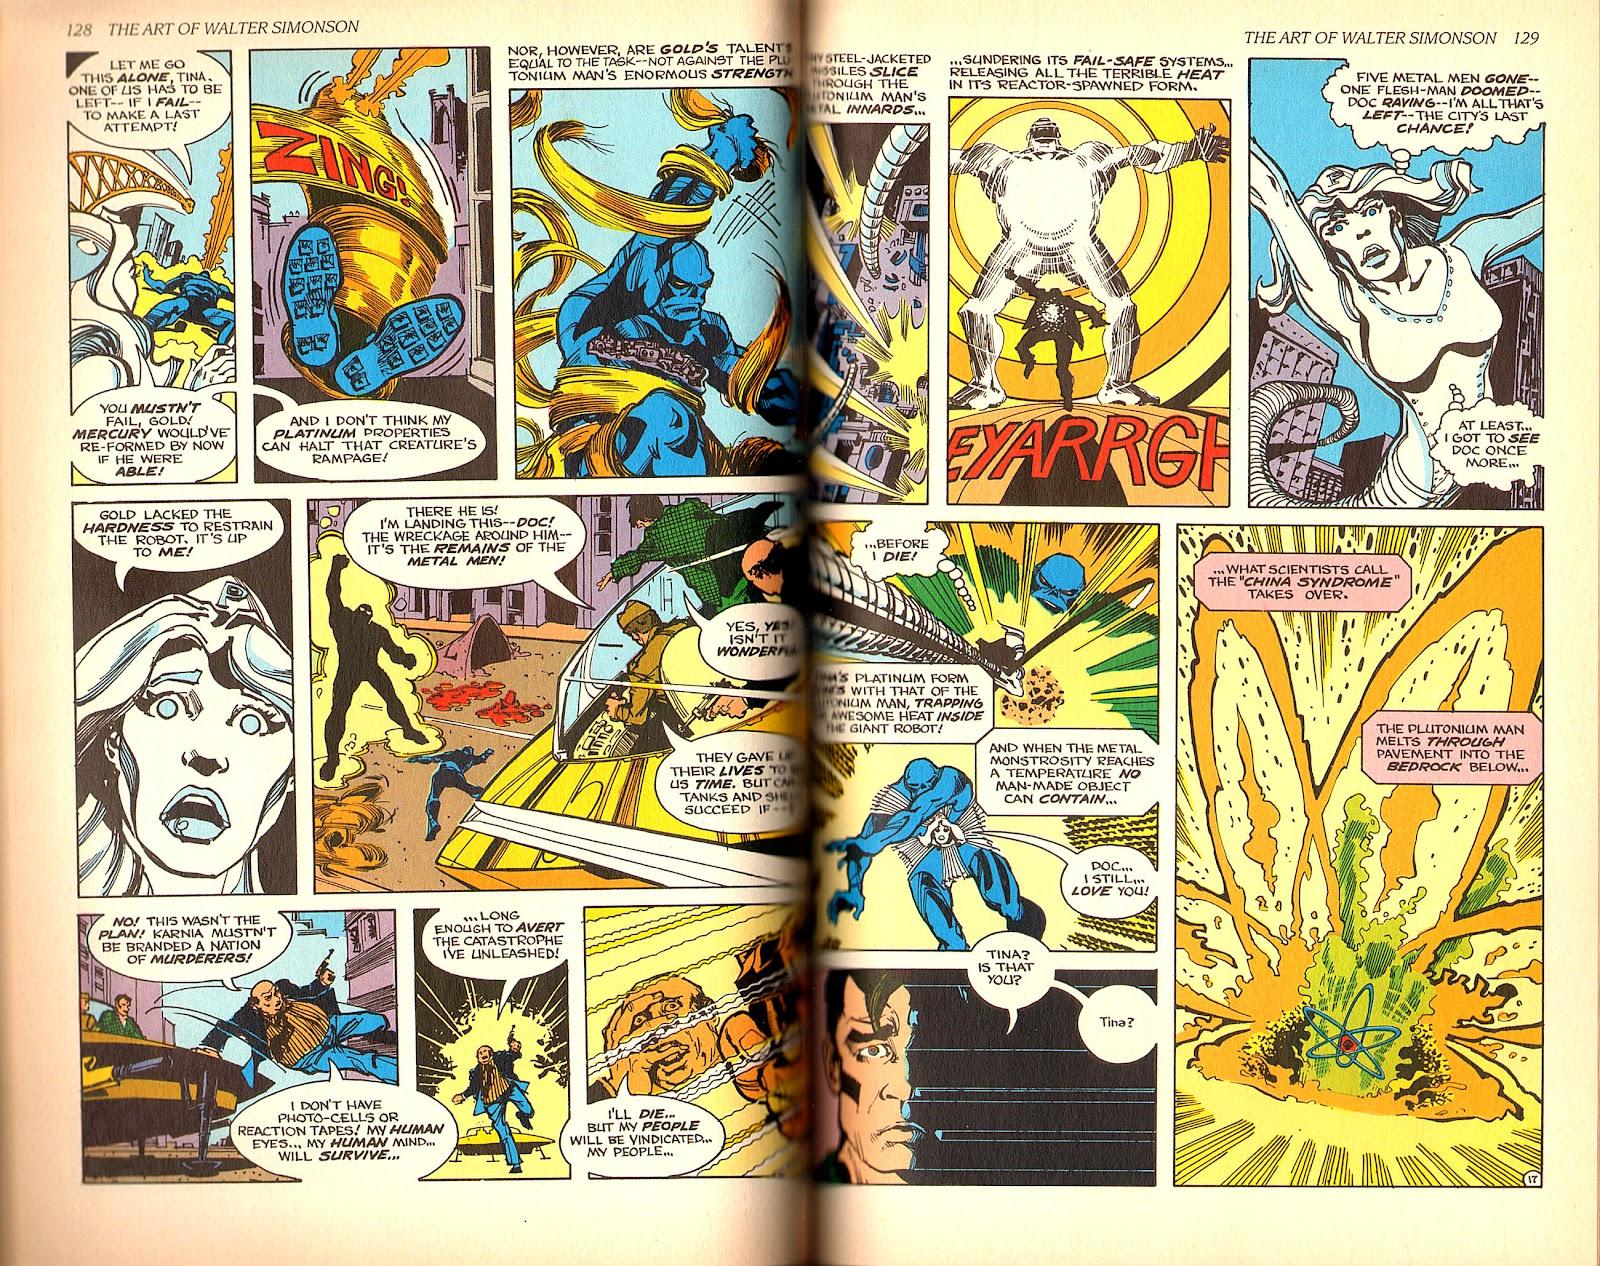 Read online The Art of Walter Simonson comic -  Issue # TPB - 66